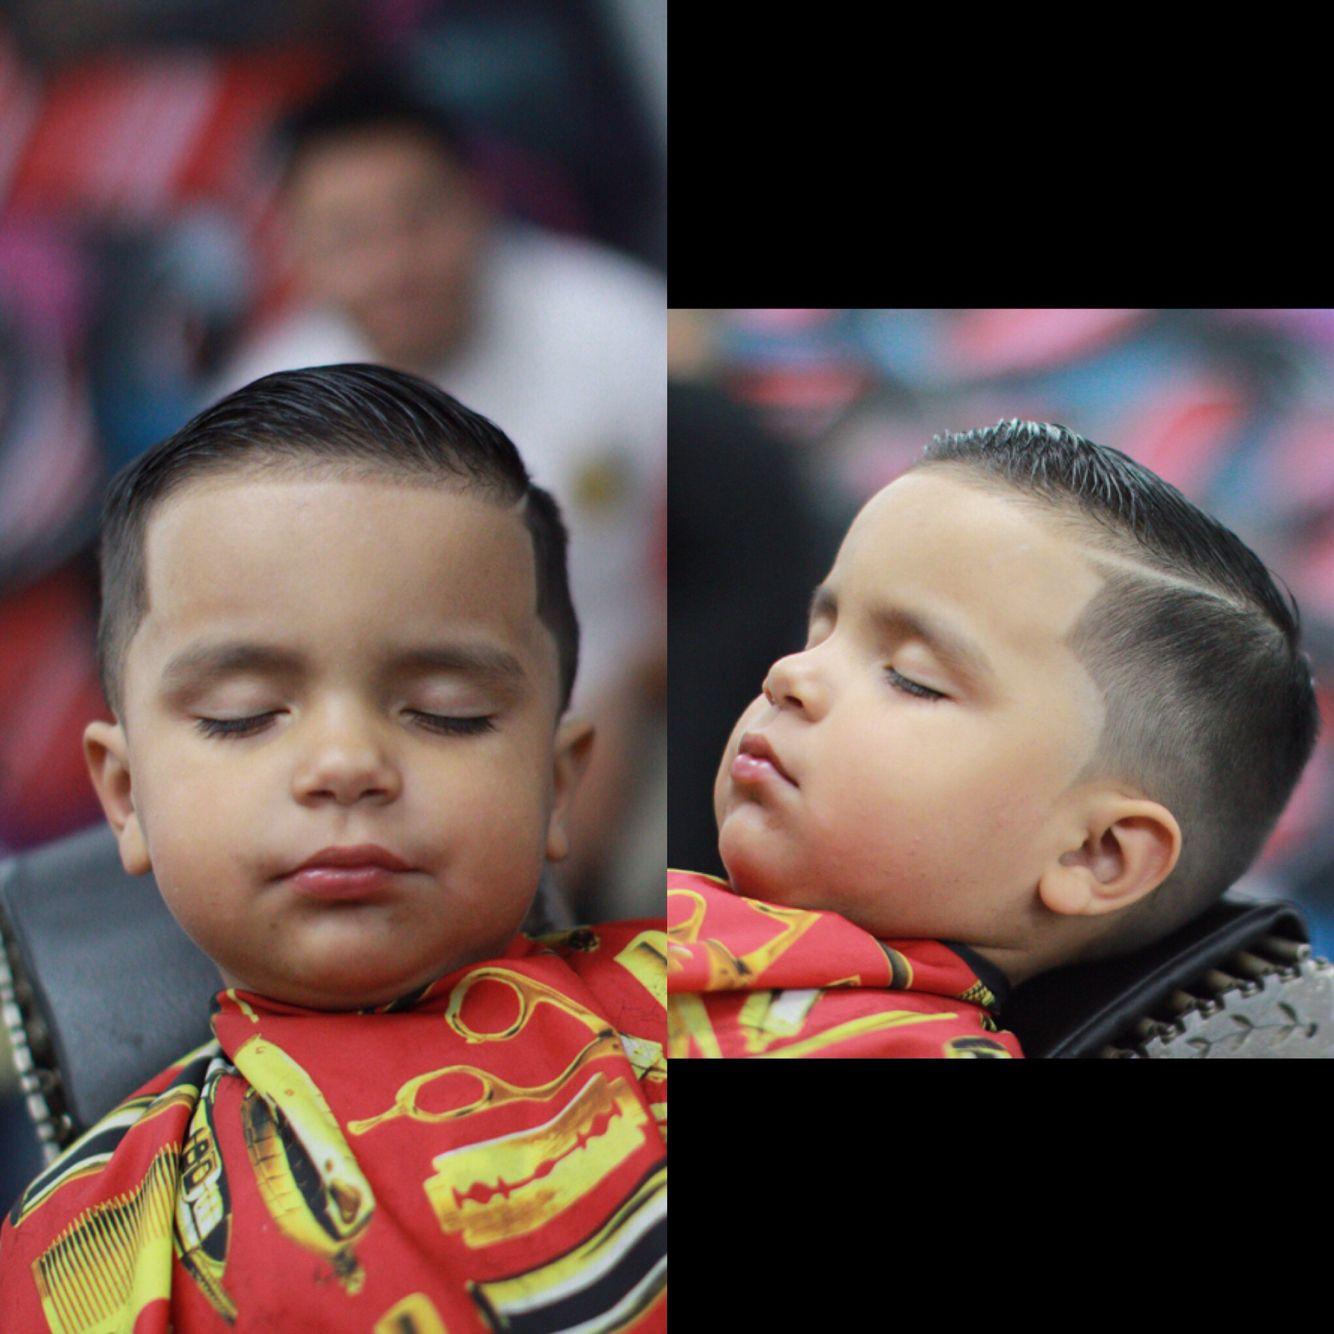 Toddler Boy Haircut (fresh Fades Maryland) My 2 Year Old